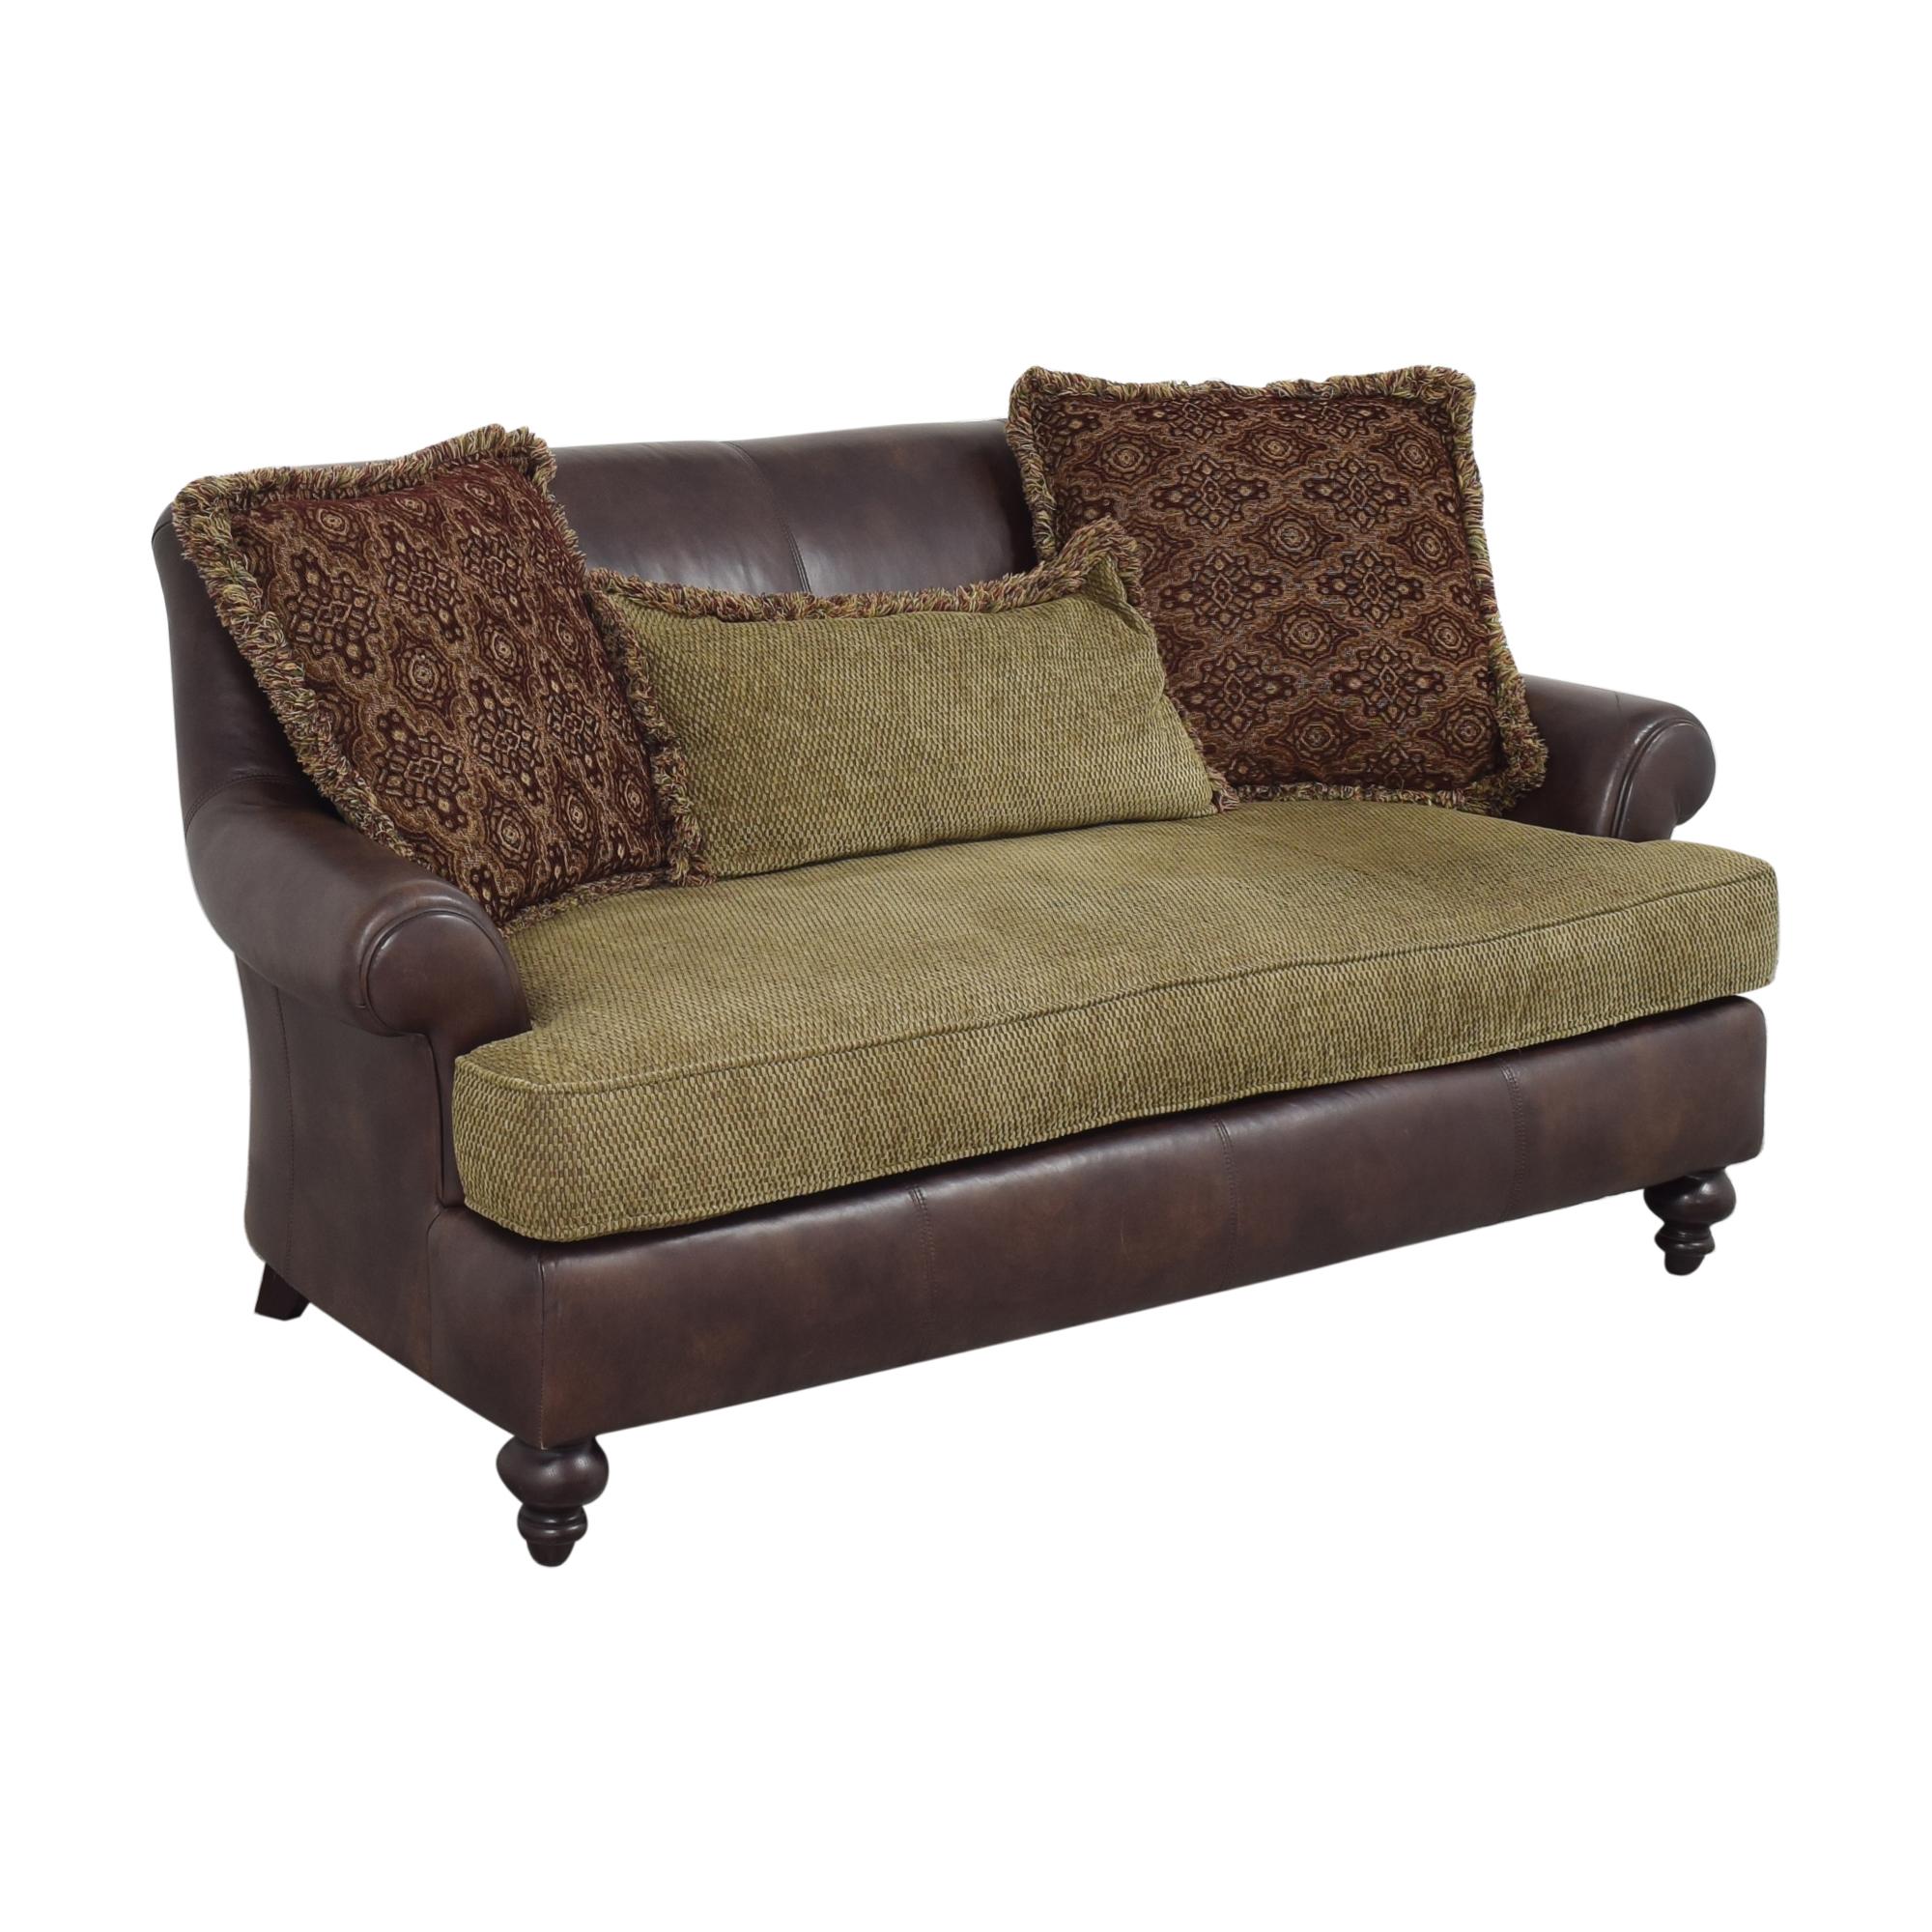 Bernhardt Bernhardt Bench Cushion Sofa nj